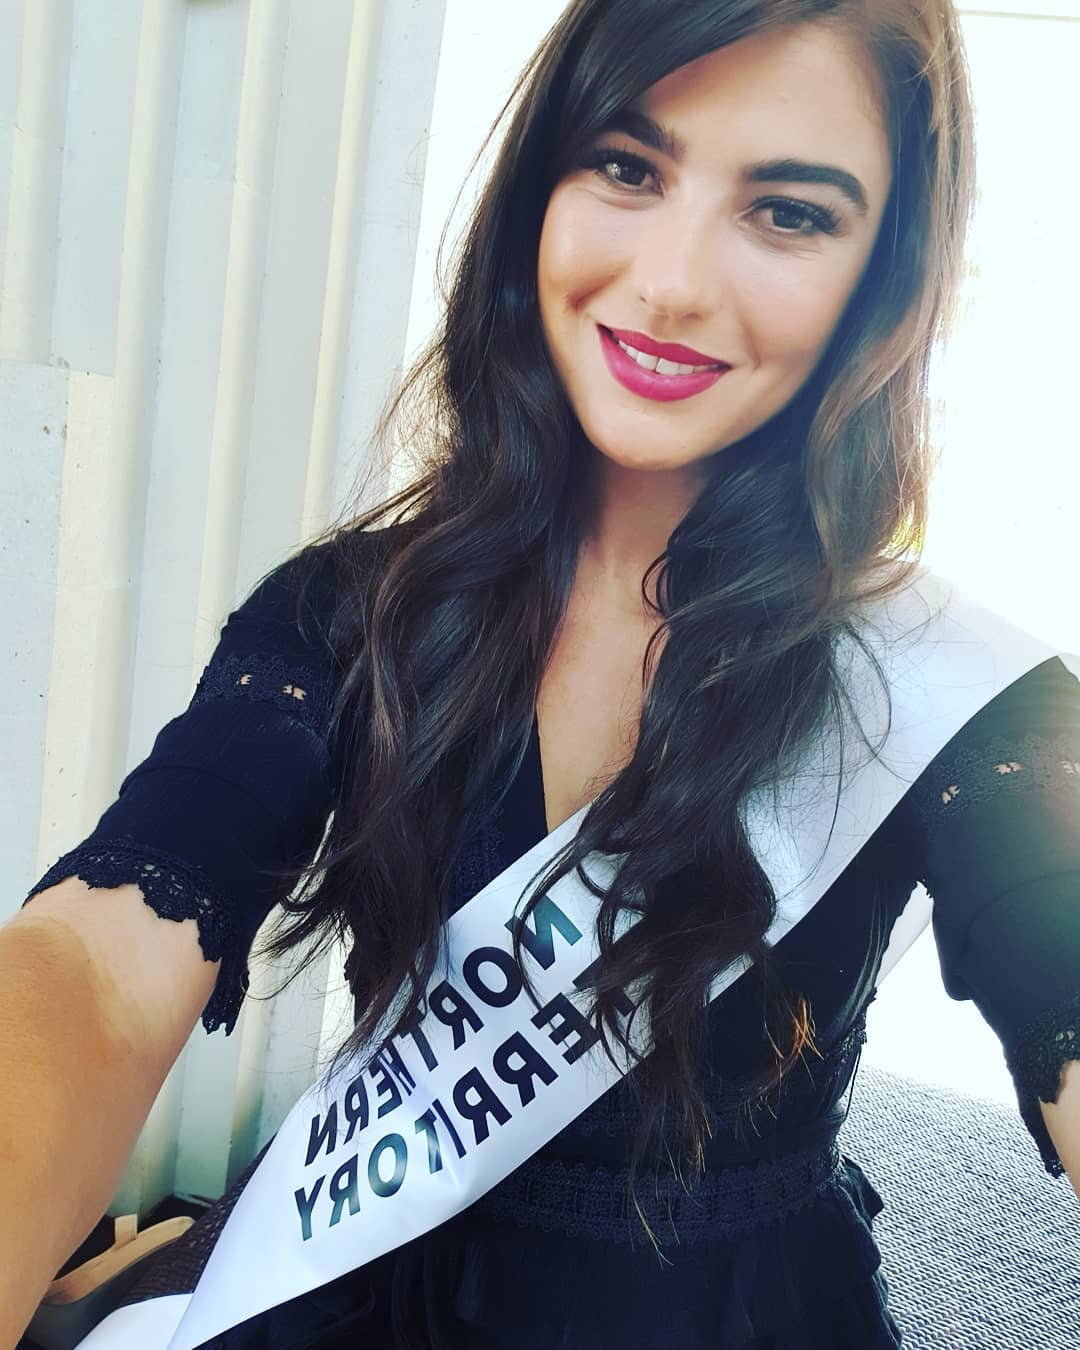 candidatas a miss universe australia 2018. final: 28 june. Ufxnvxl9